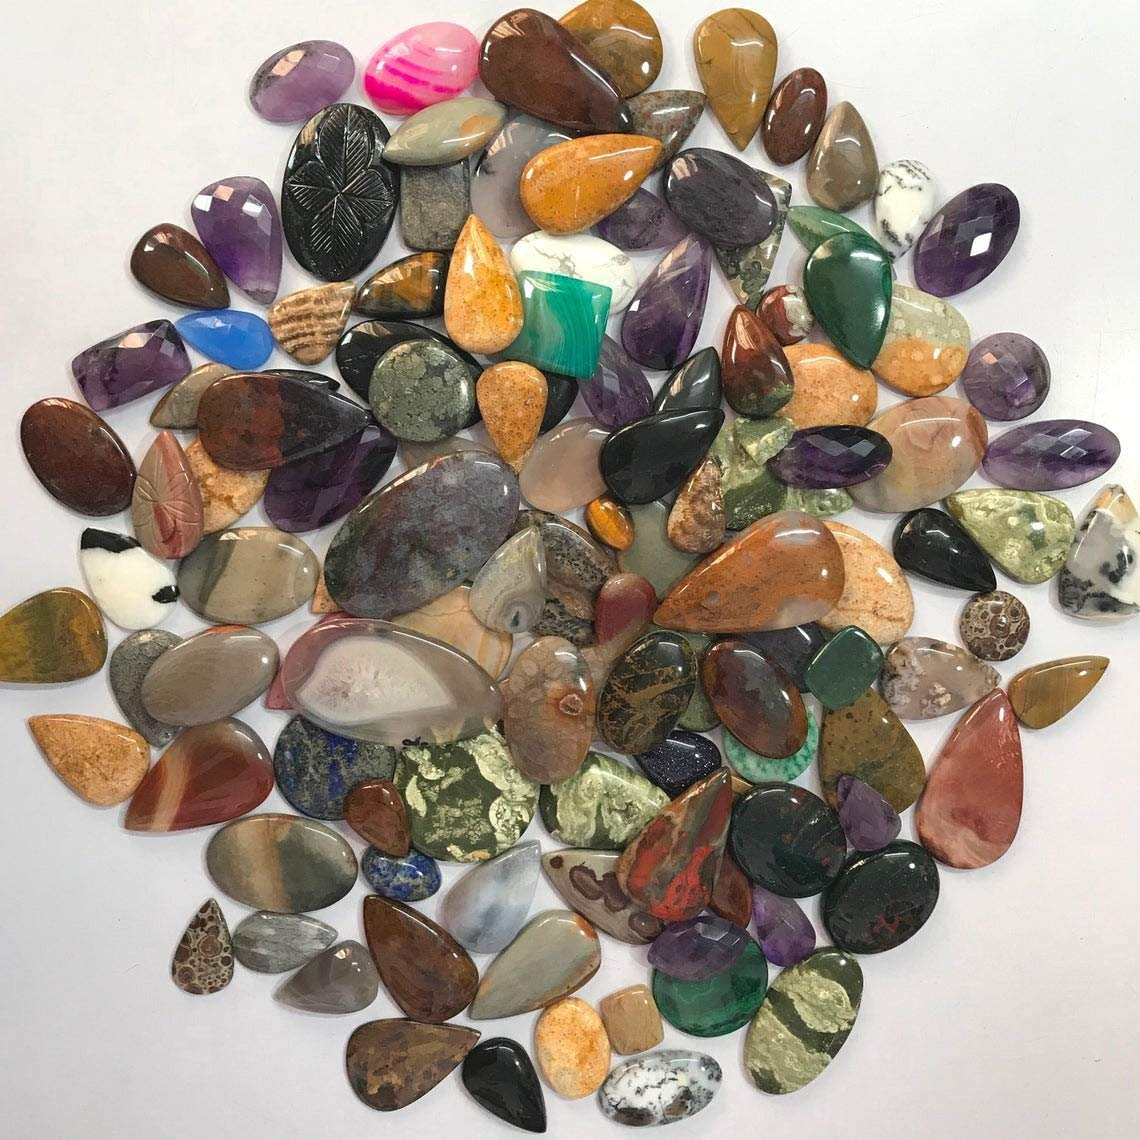 Gemkora 4 to 6pcs Natural Mix Gemstones Wholesale Cabochons Lot, Jewelry Making Loose Gemstone, Polished Decor Specimen, DIY, Wire Wrapping, Healing Crystals, Bulk Gemstone Deal (100 carats)